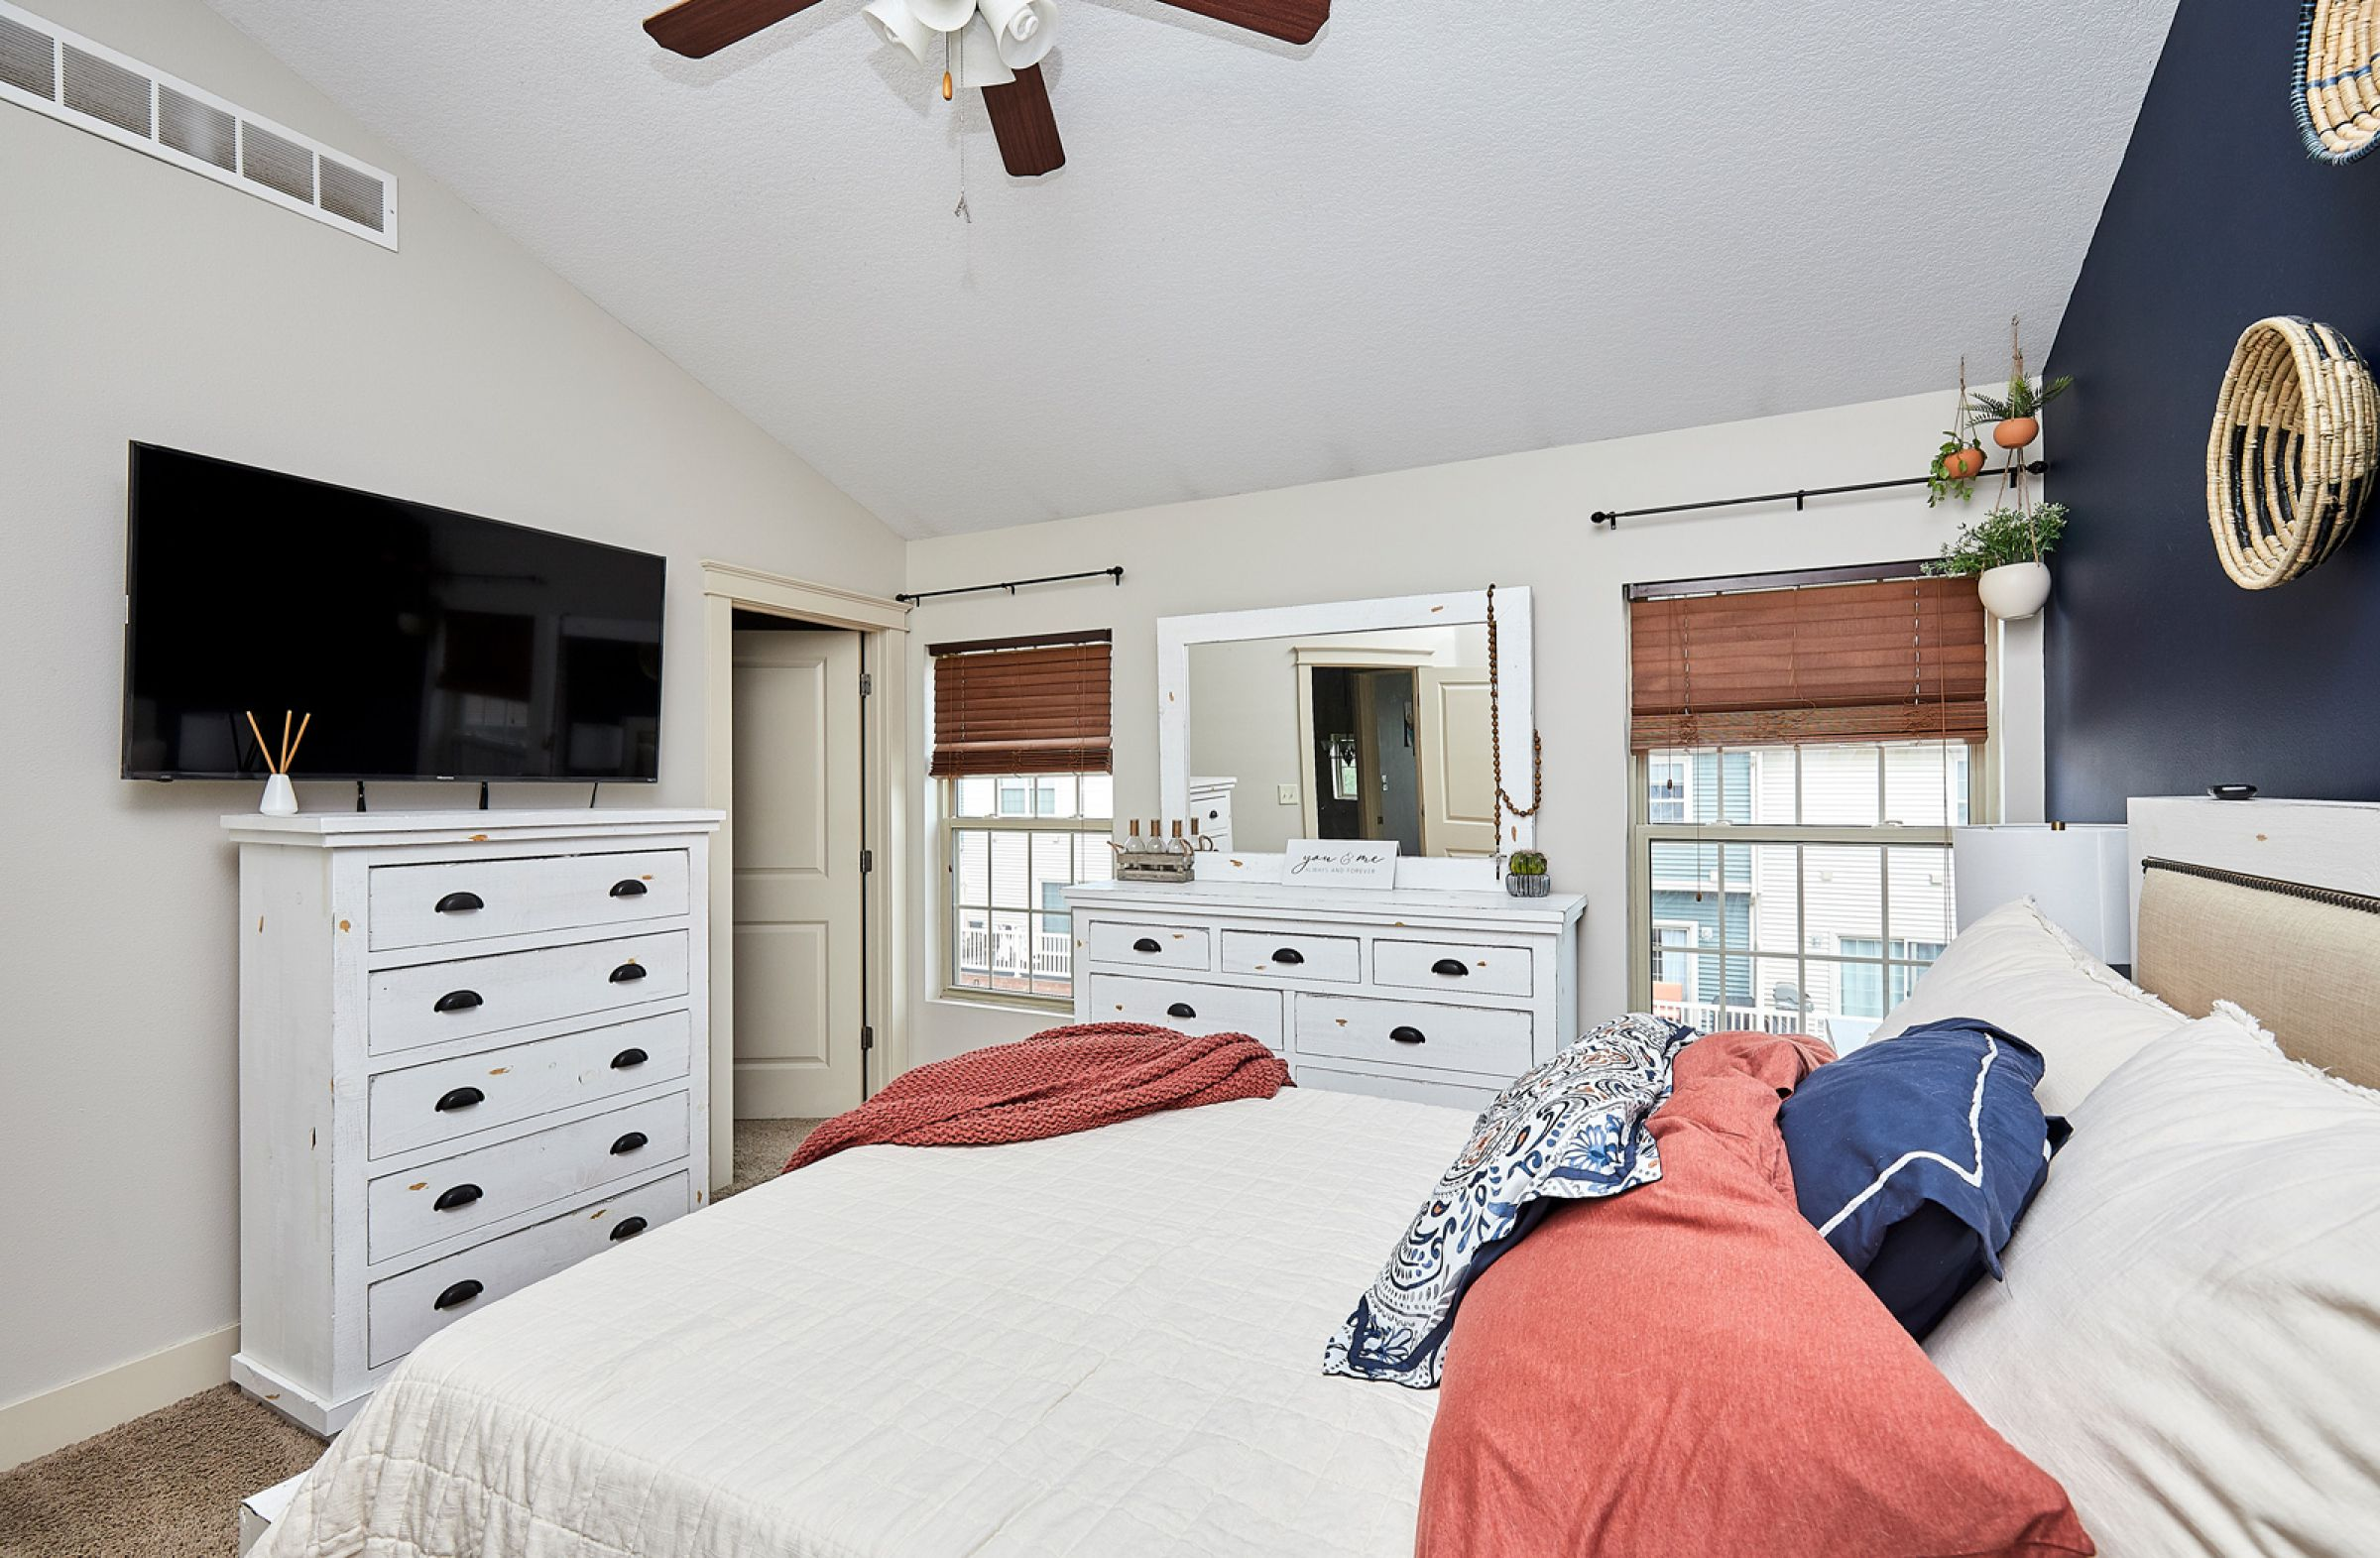 residential-polk-county-iowa-0-acres-listing-number-15662-5-2021-08-03-023529.jpg